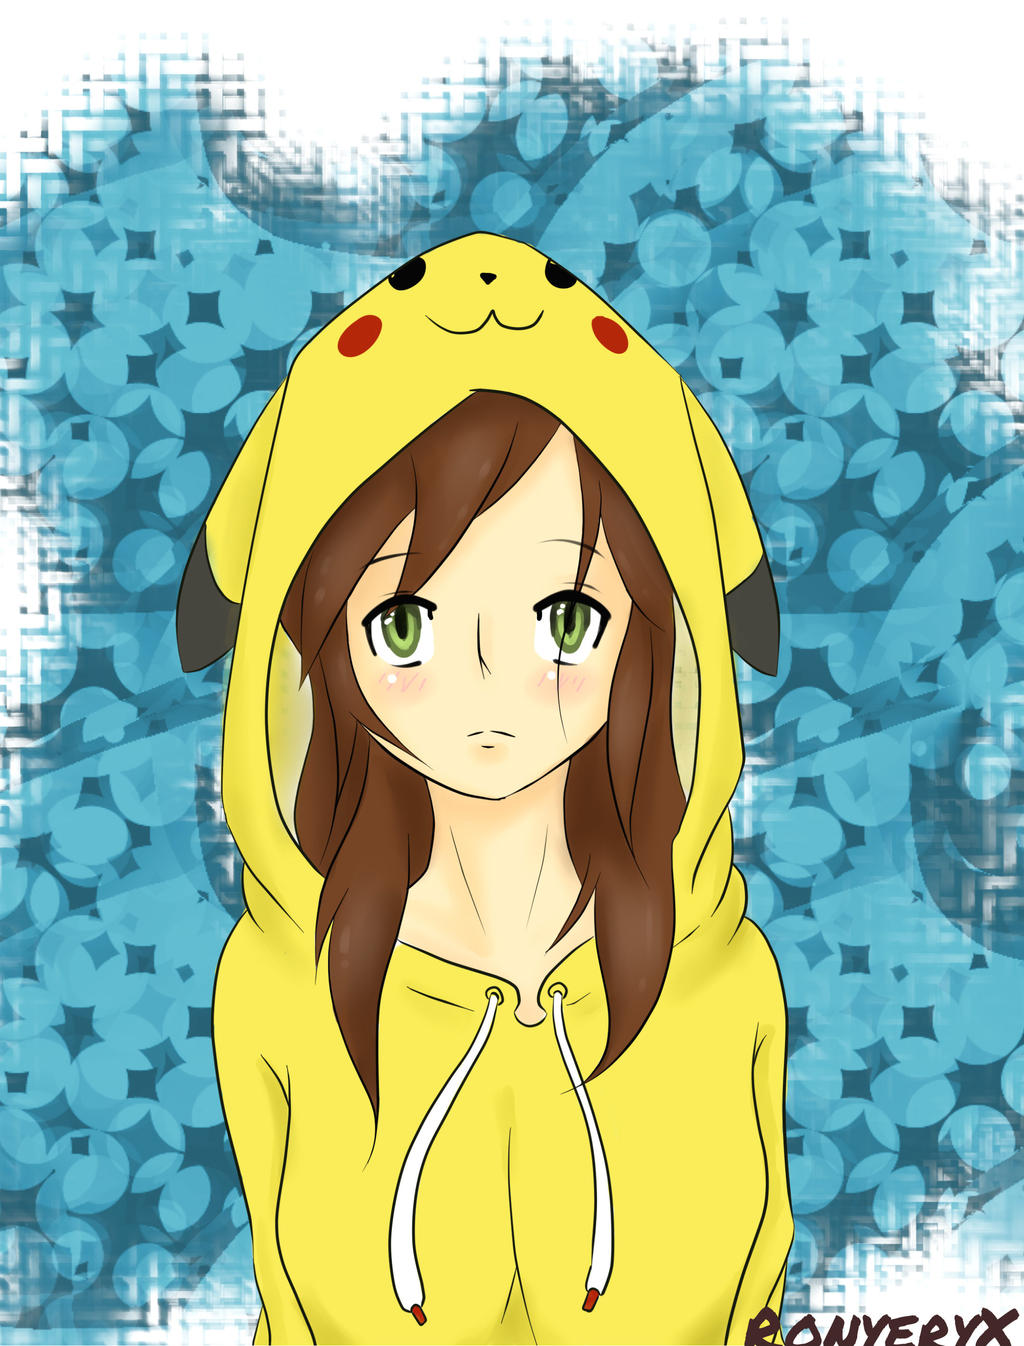 Anime Girl With Headphones And Hoodie 64786 Loadtve